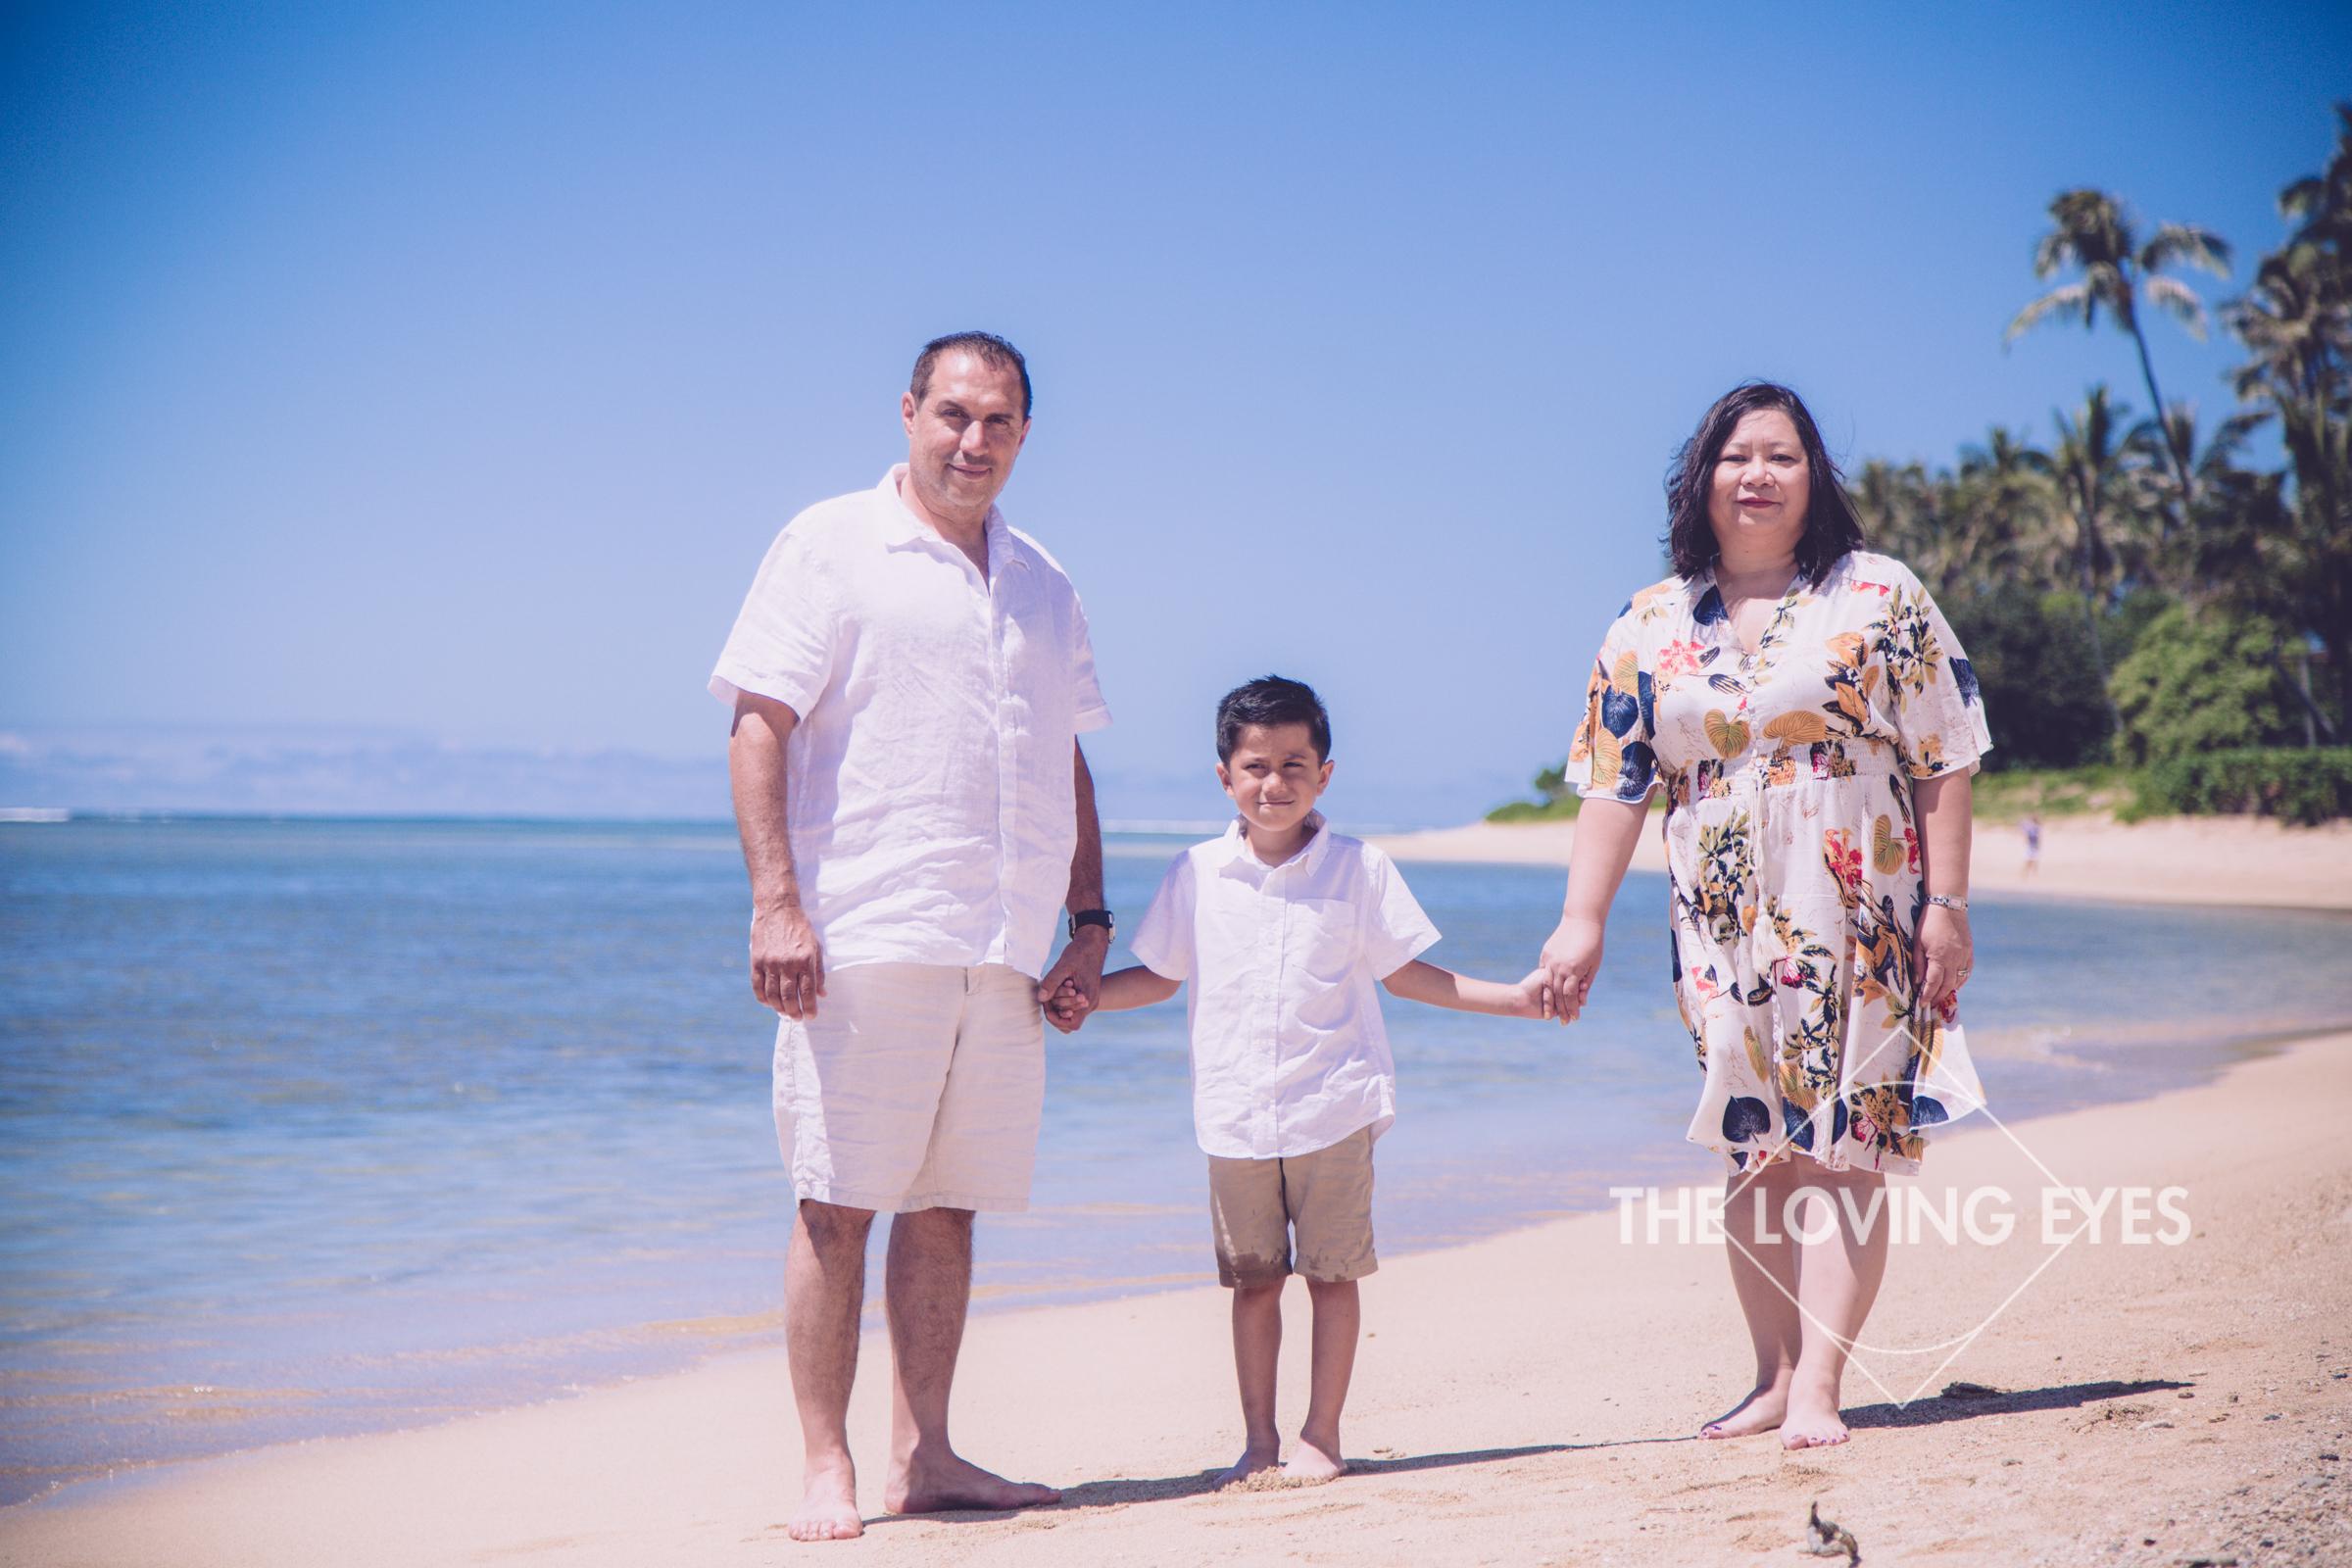 Hawaii vacation beach photo-3.jpg